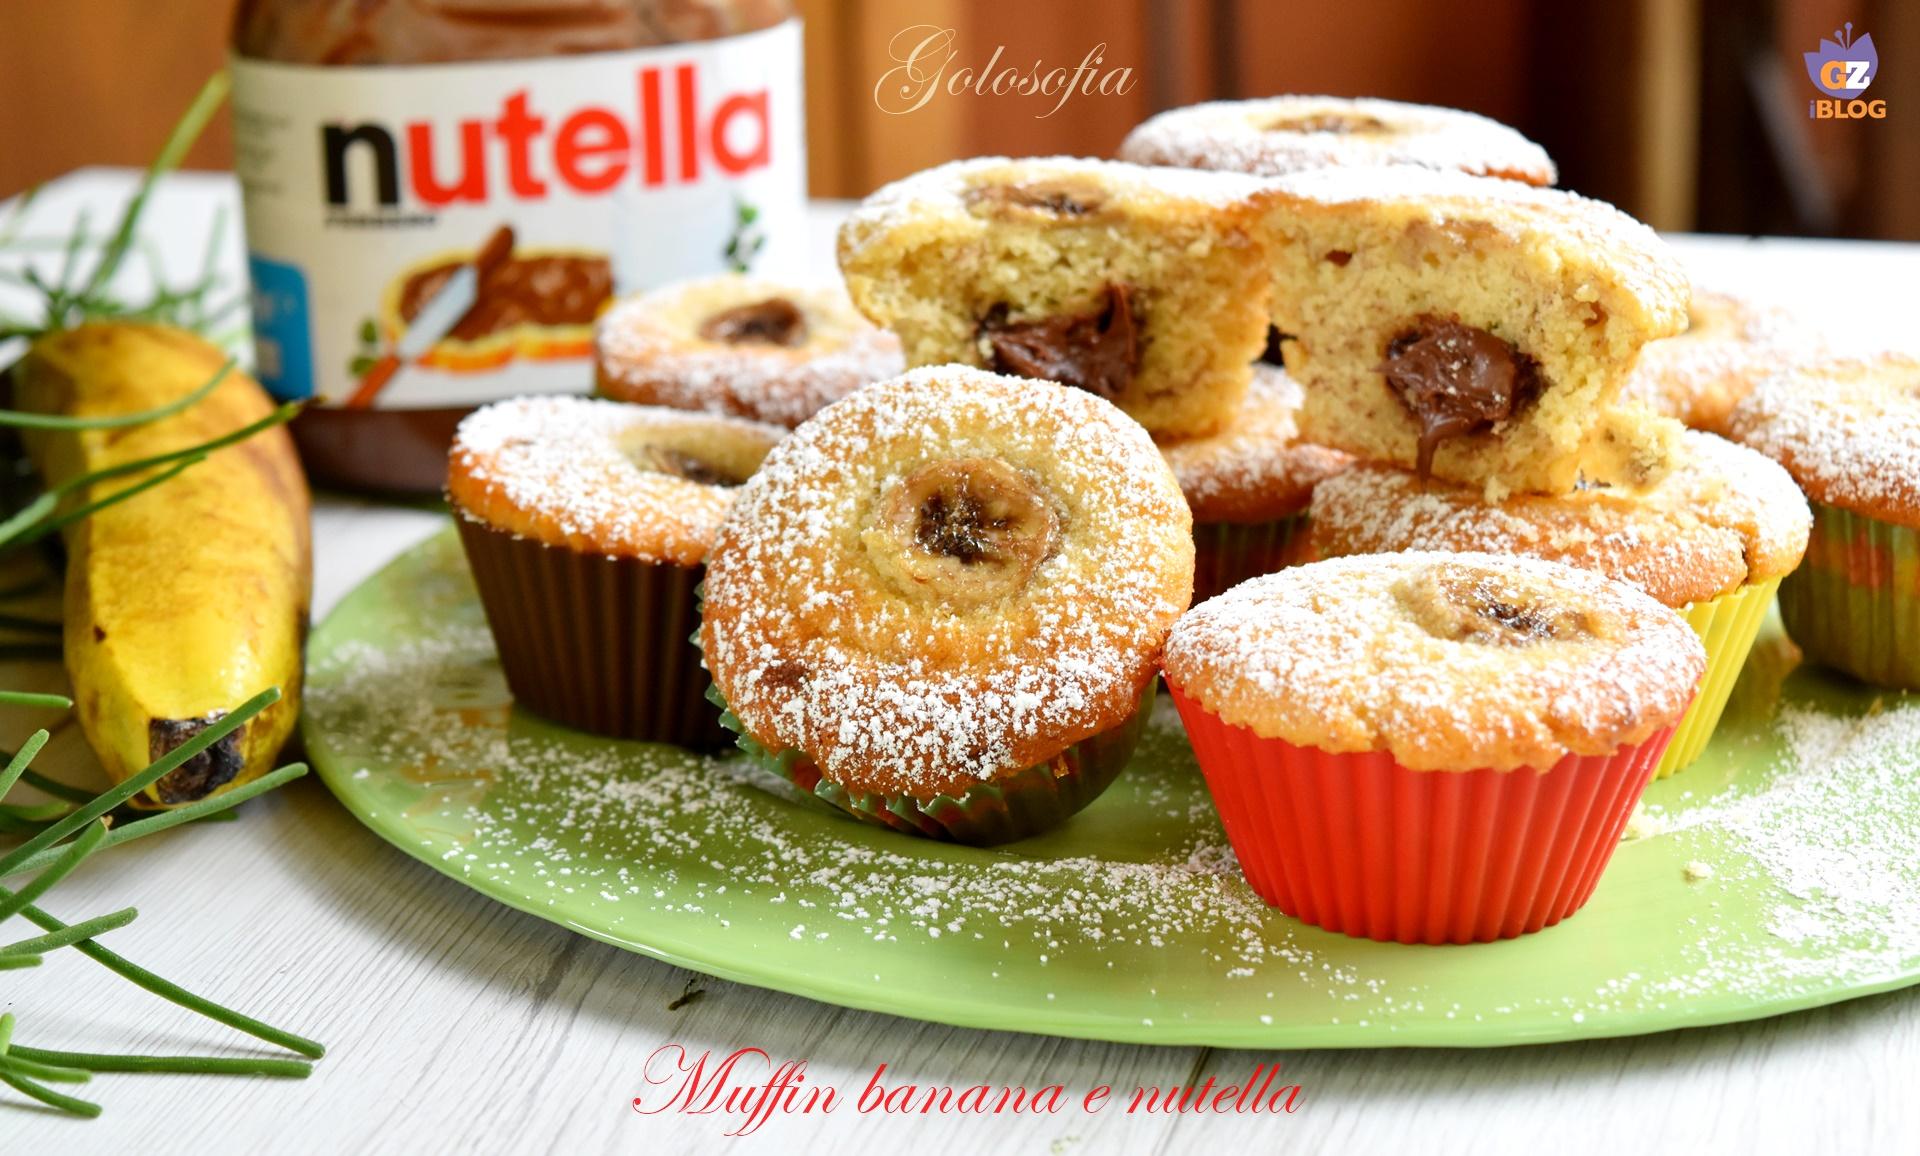 Muffin banana e nutella-ricetta dolci-golosofia